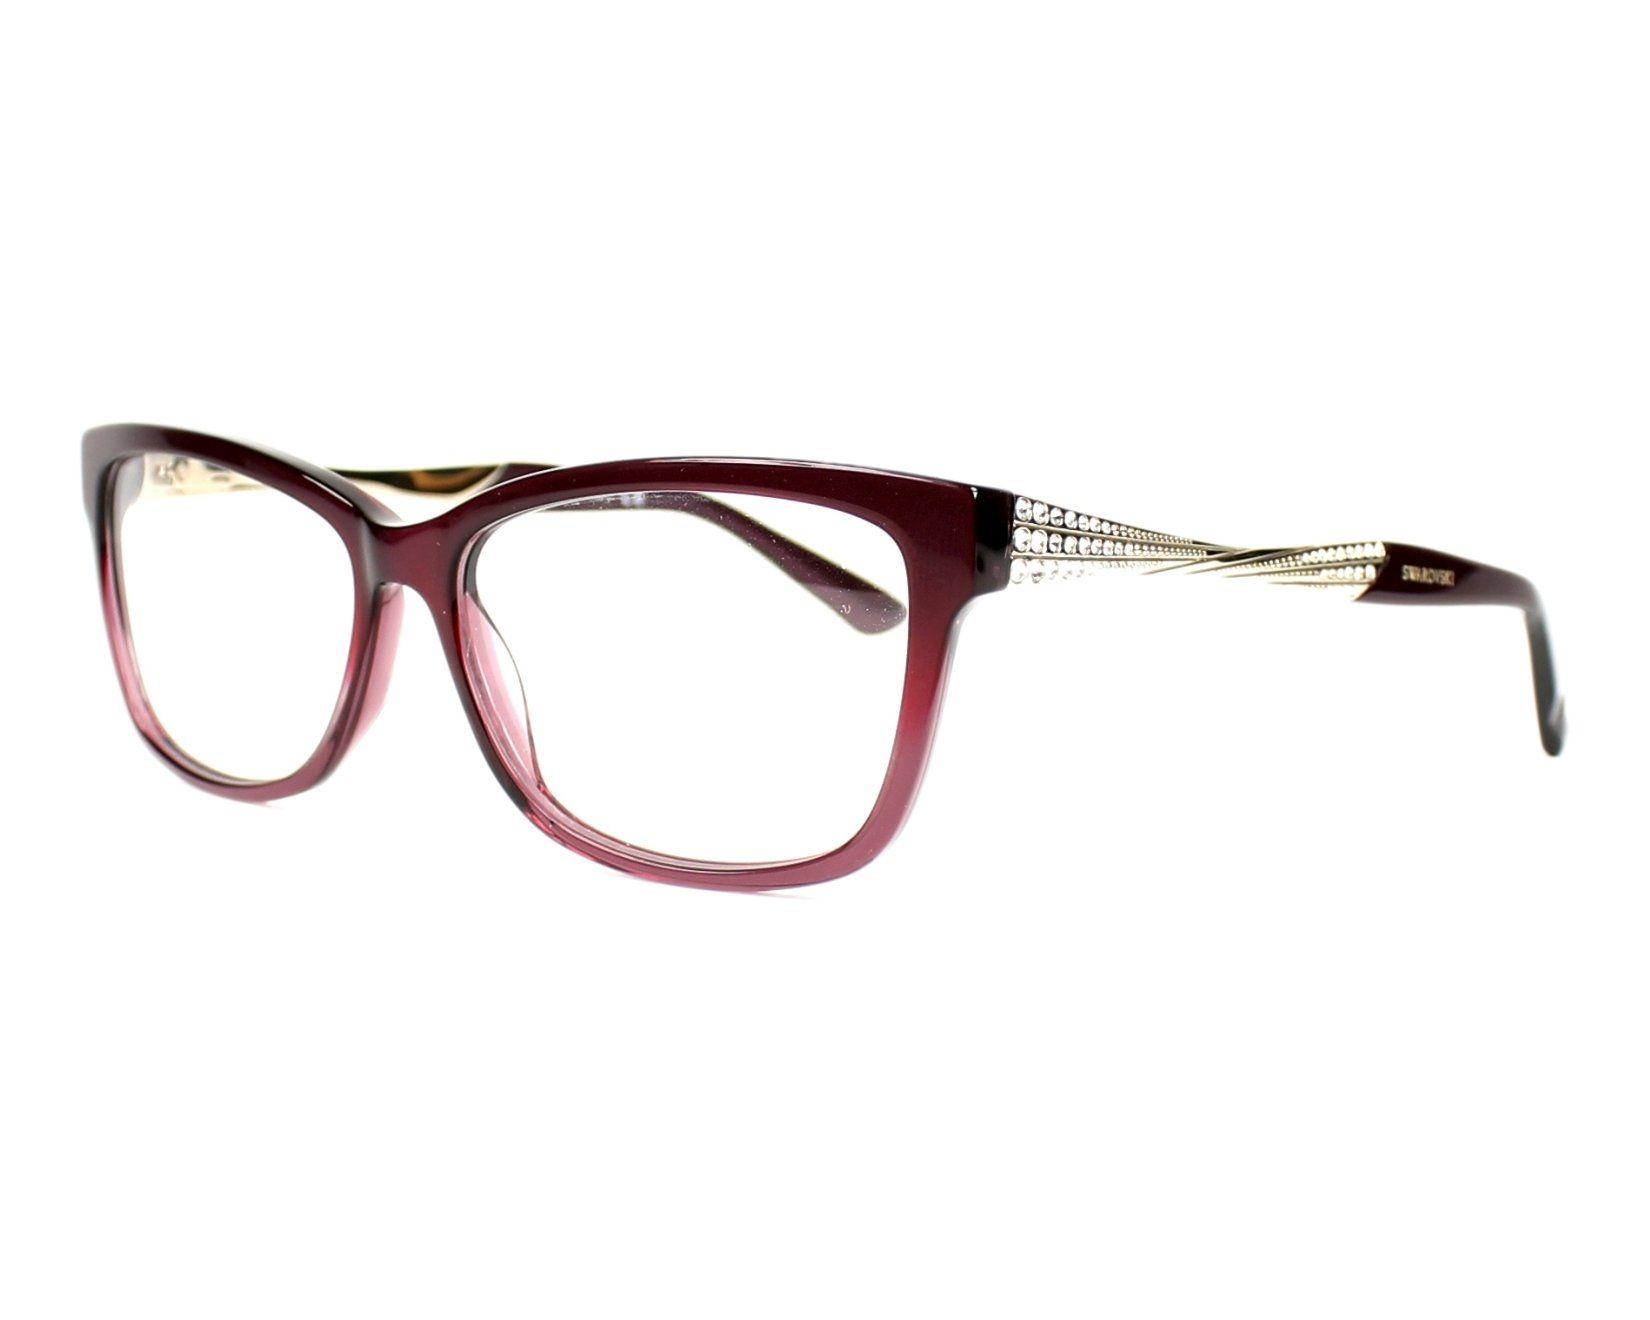 4cef050250 eyeglasses Swarovski SW-5145 071 54-14 Lila Silver profile view ...